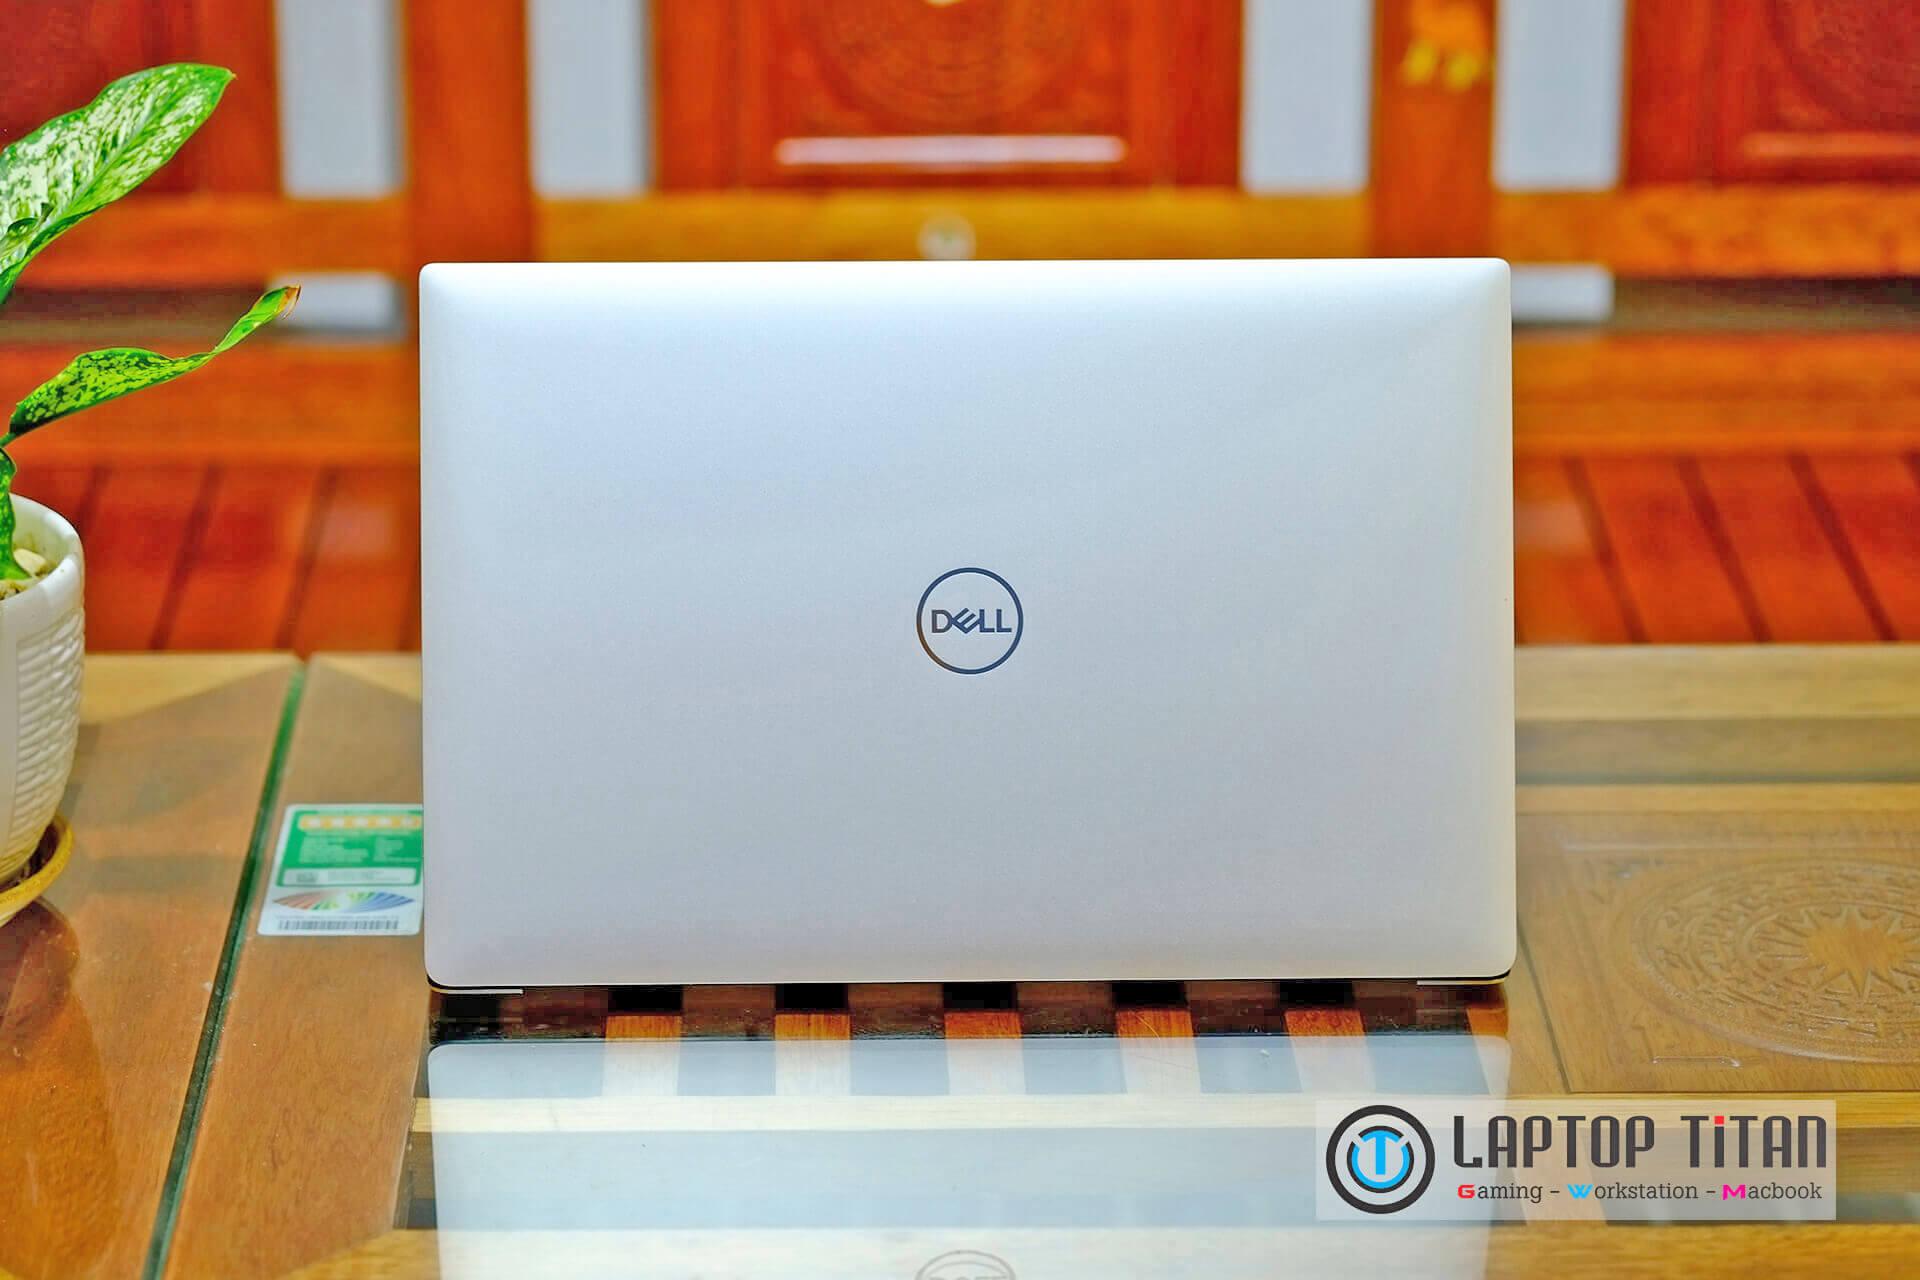 "Dell XPS 15 9570 i7 8750H / 16GB / 512GB / GTX 1050Ti / 15.6"" UHD Touch / New 99%"